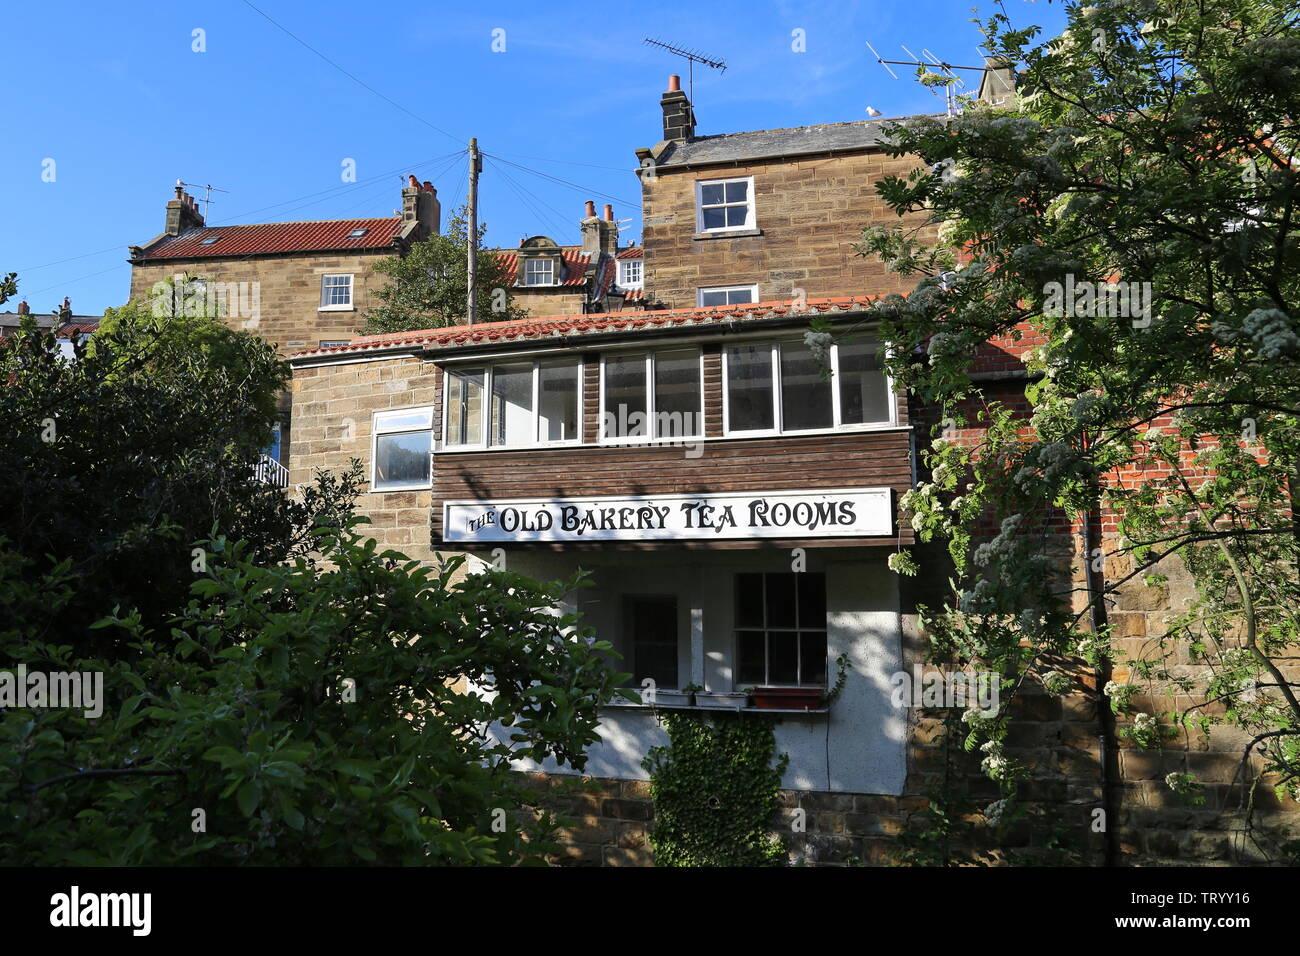 Old Bakery Tea Rooms, Chapel Street, Robin Hood's Bay, Borough of Scarborough, North Yorkshire, England, Great Britain, United Kingdom, UK, Europe Stock Photo